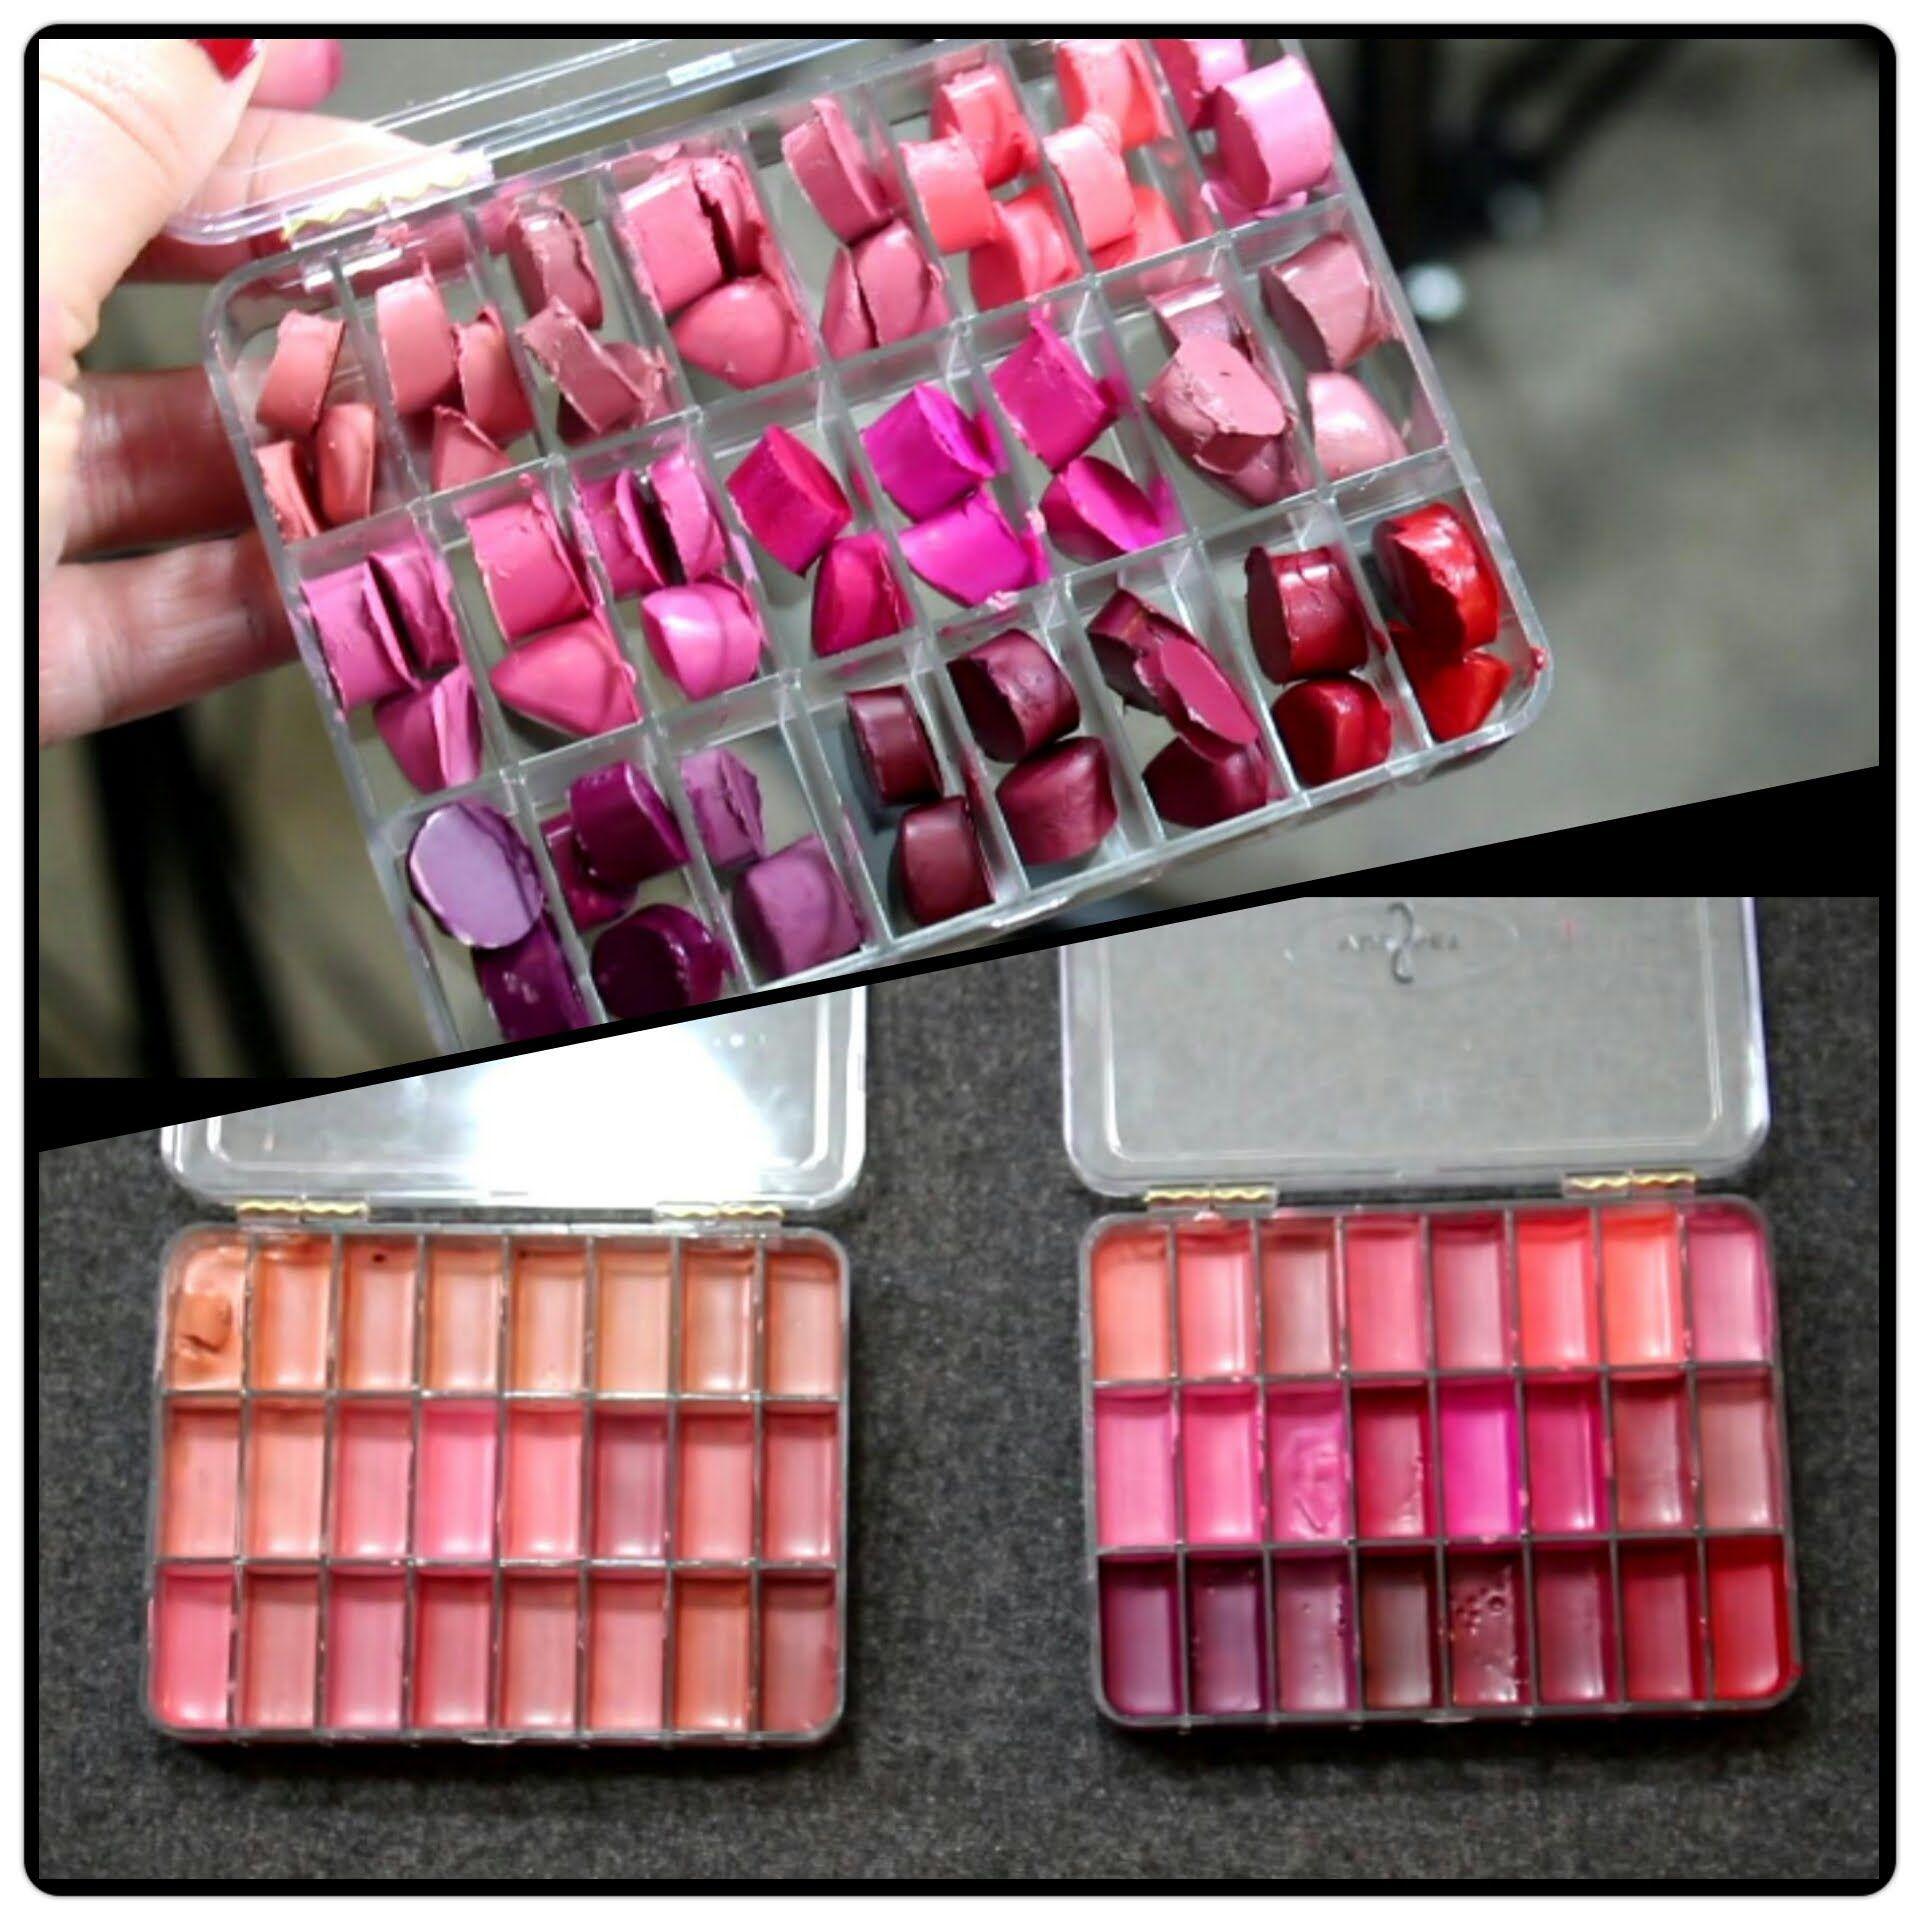 Melting/Depotting lipsticks into a Vueset Palette